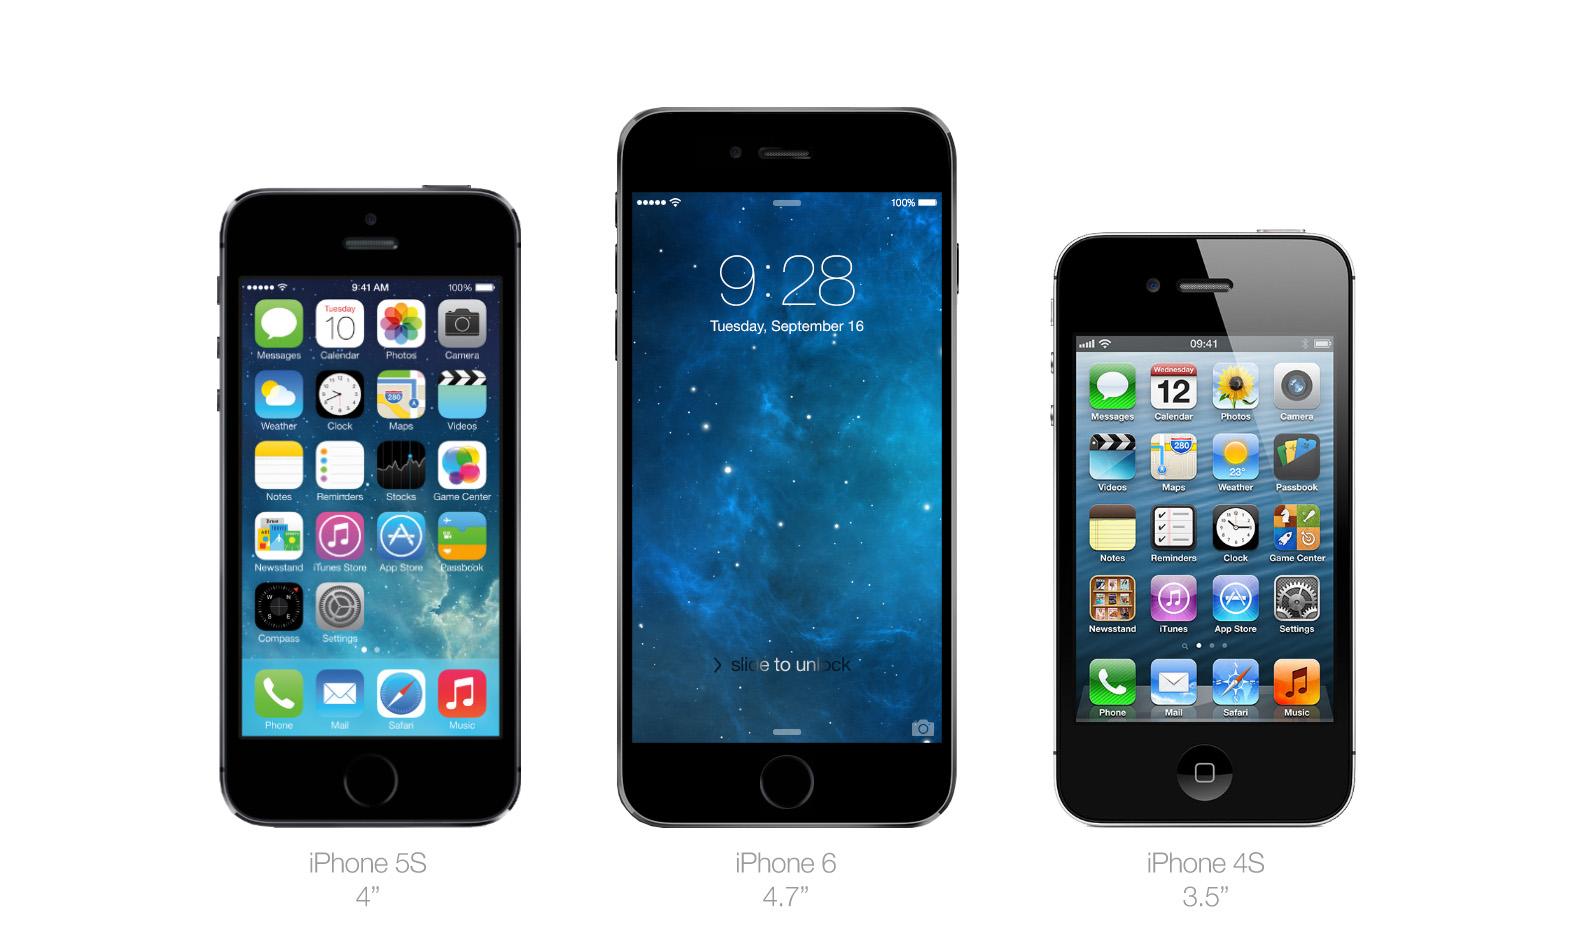 iPhone 6 smartphone